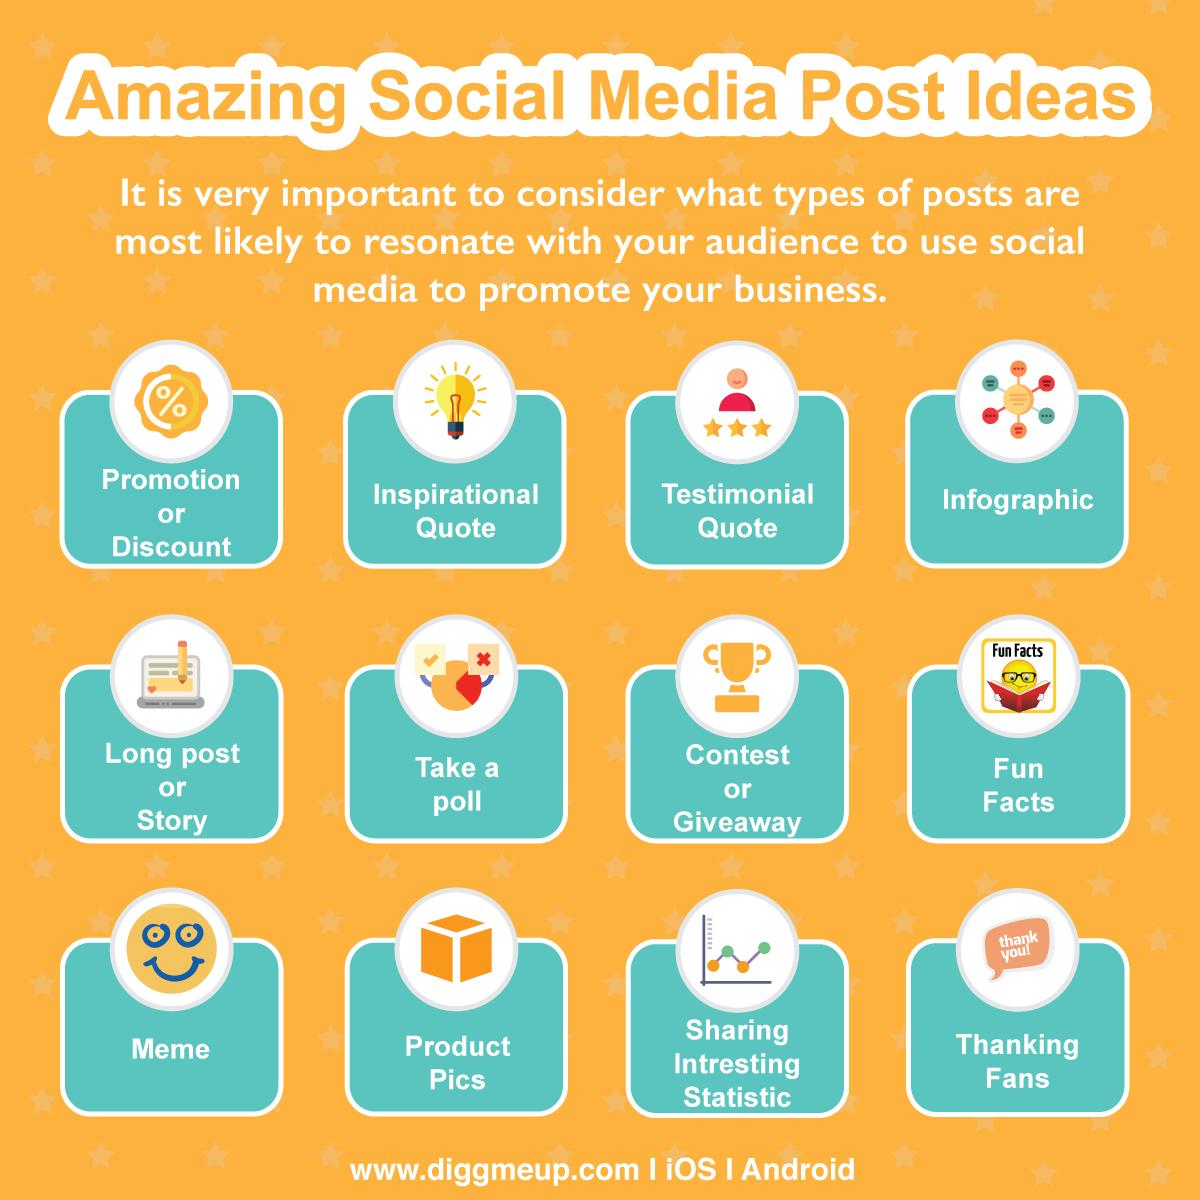 Amazing Social Media Post Ideas Socialmedia Smallbiz Marketing Entrepreneur Infographic Business Quote Poll Contest Facts Meme Statistics Testimoni